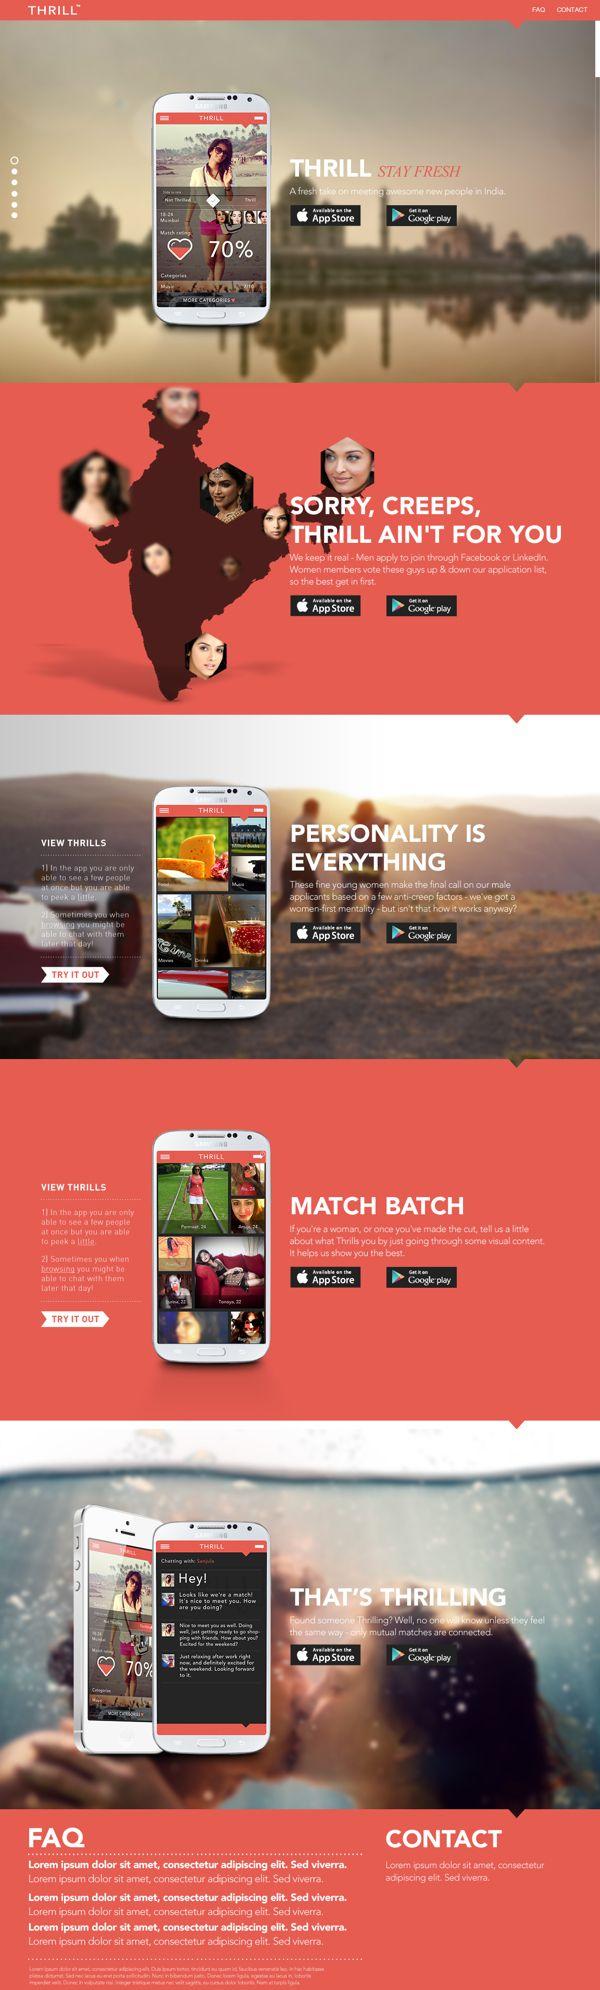 dating web design inspiration